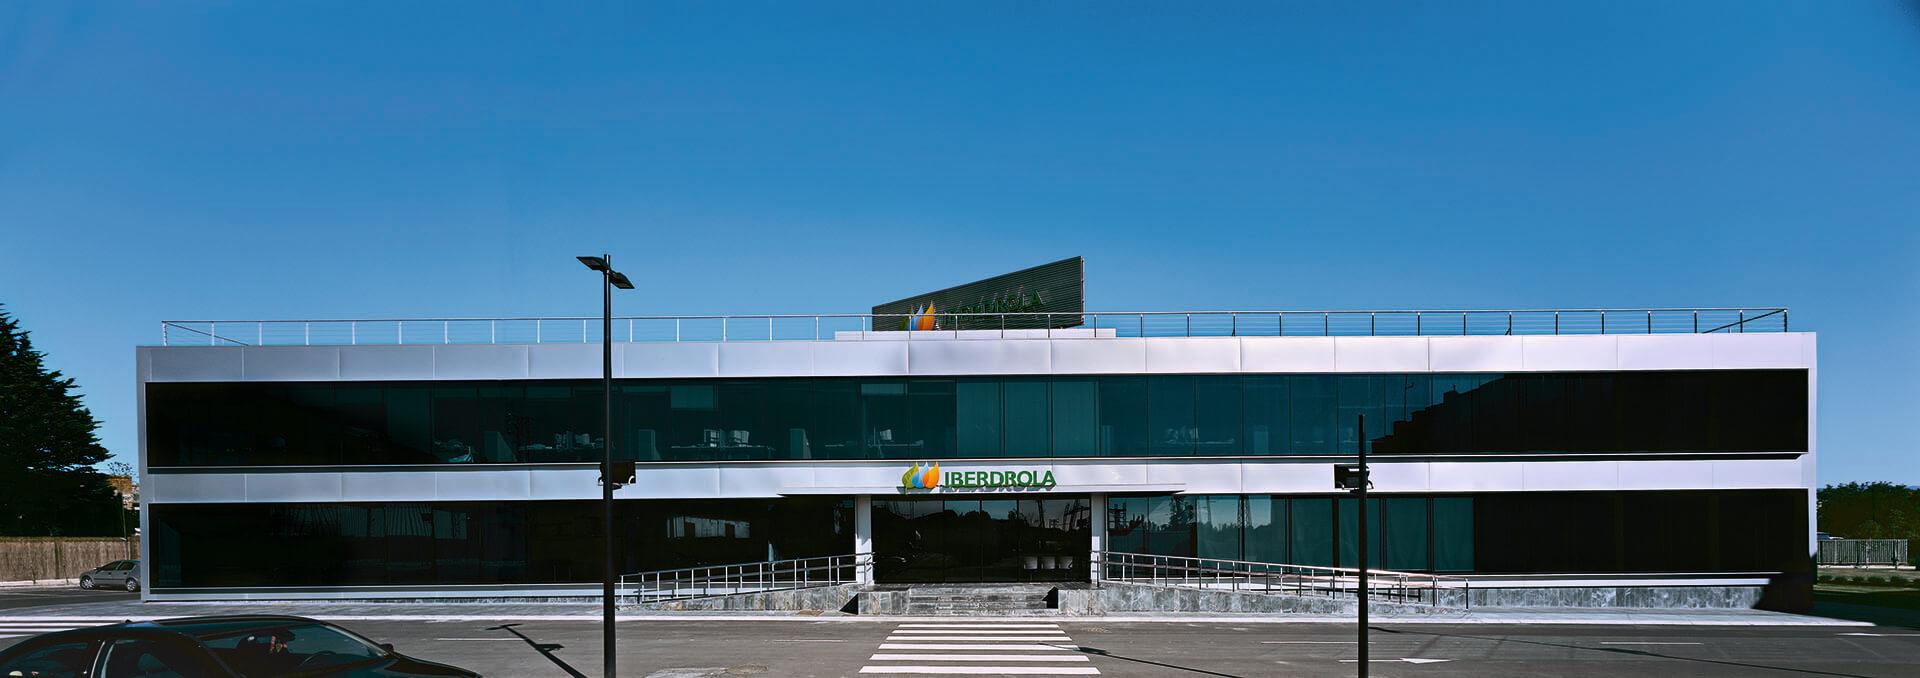 Oficinas Iberdrola Logroño